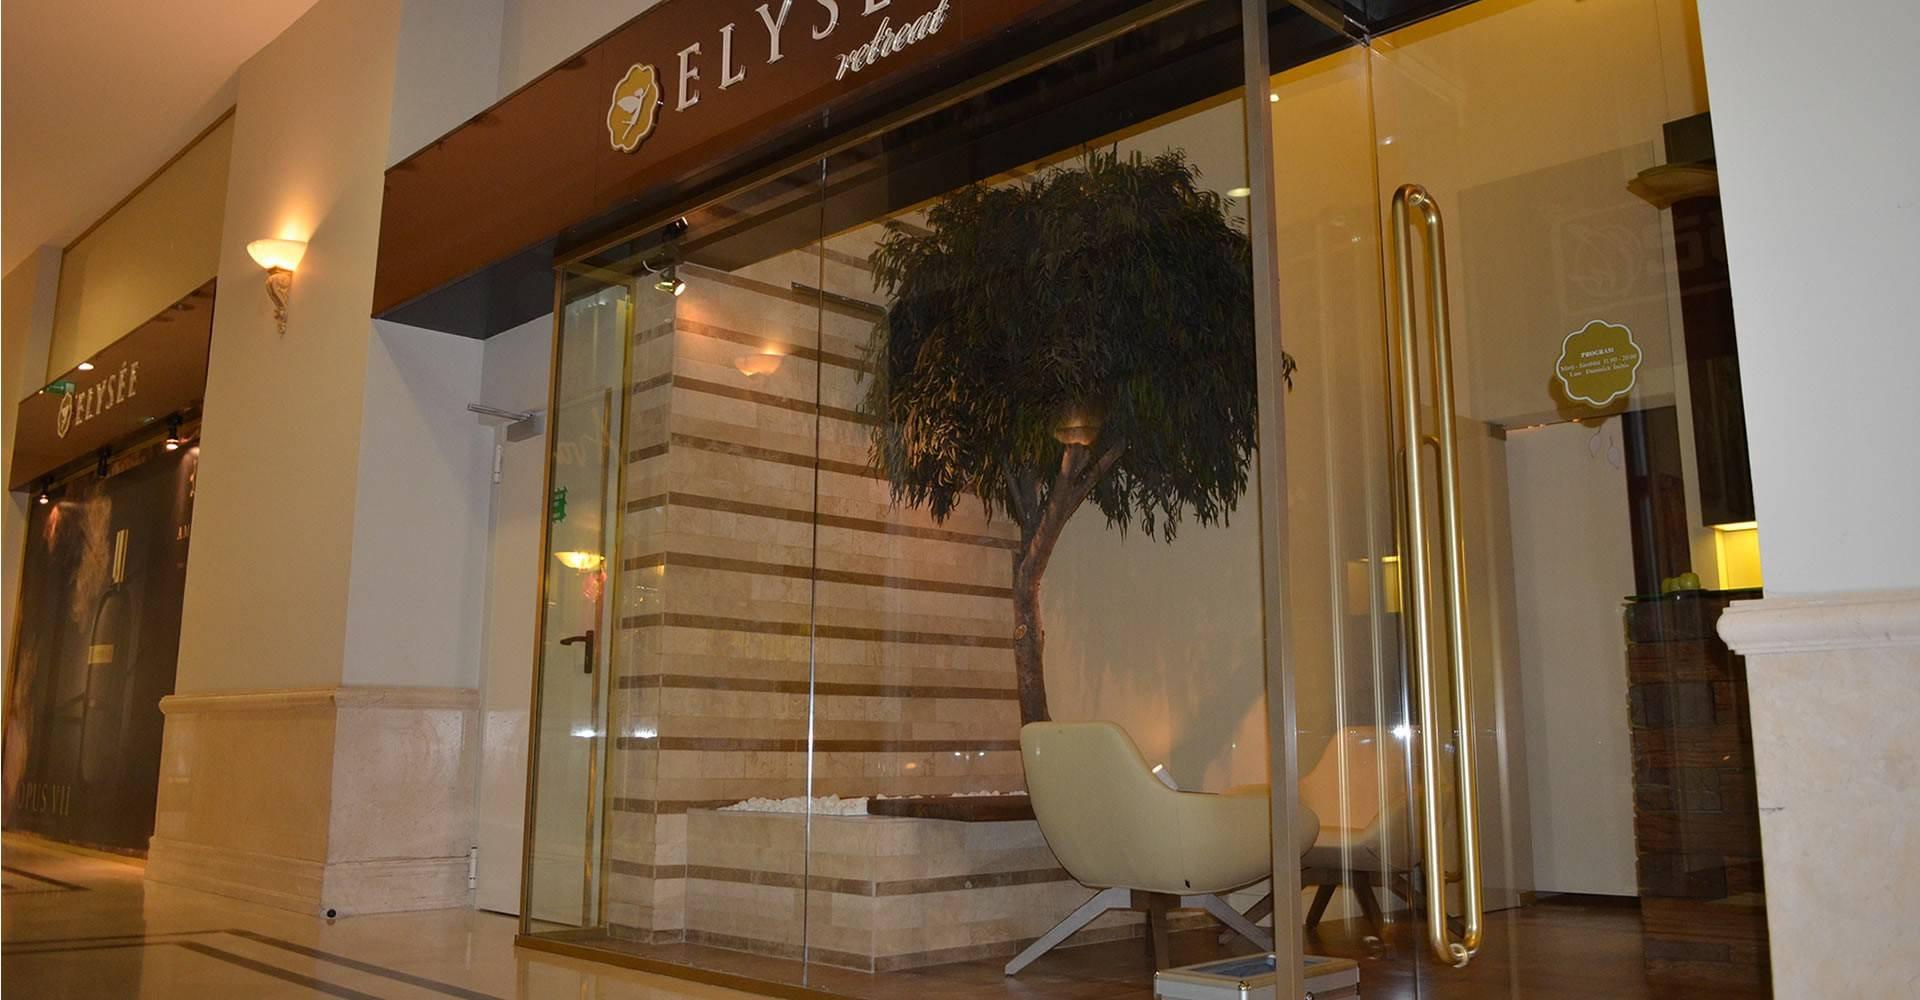 proiect-elysee-01